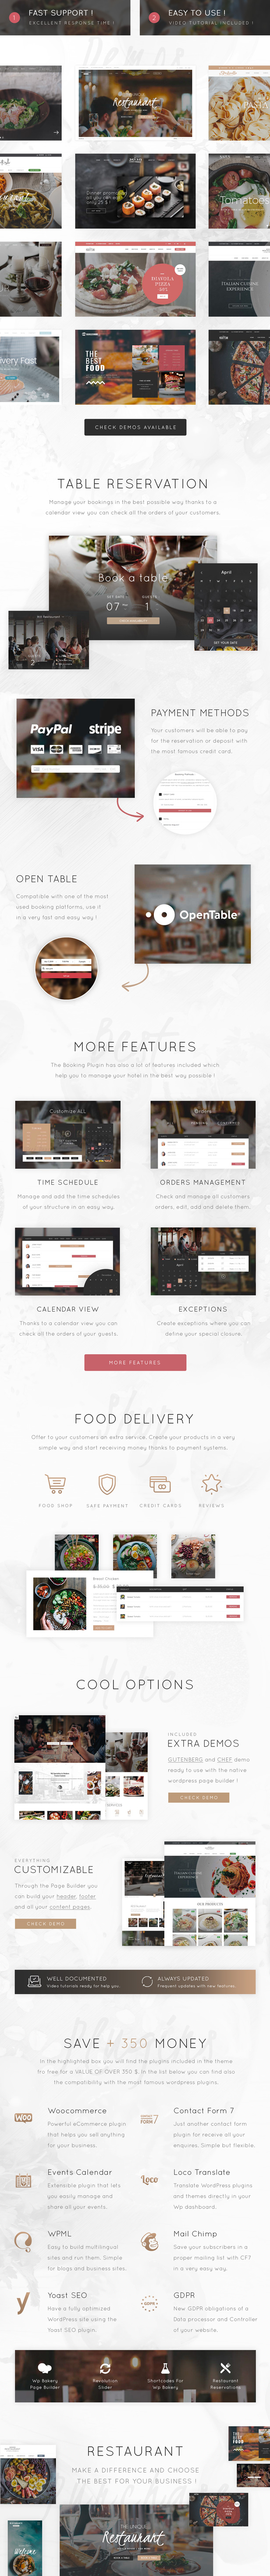 Ristorante – 美食餐厅餐馆WordPress主题 – v1.6